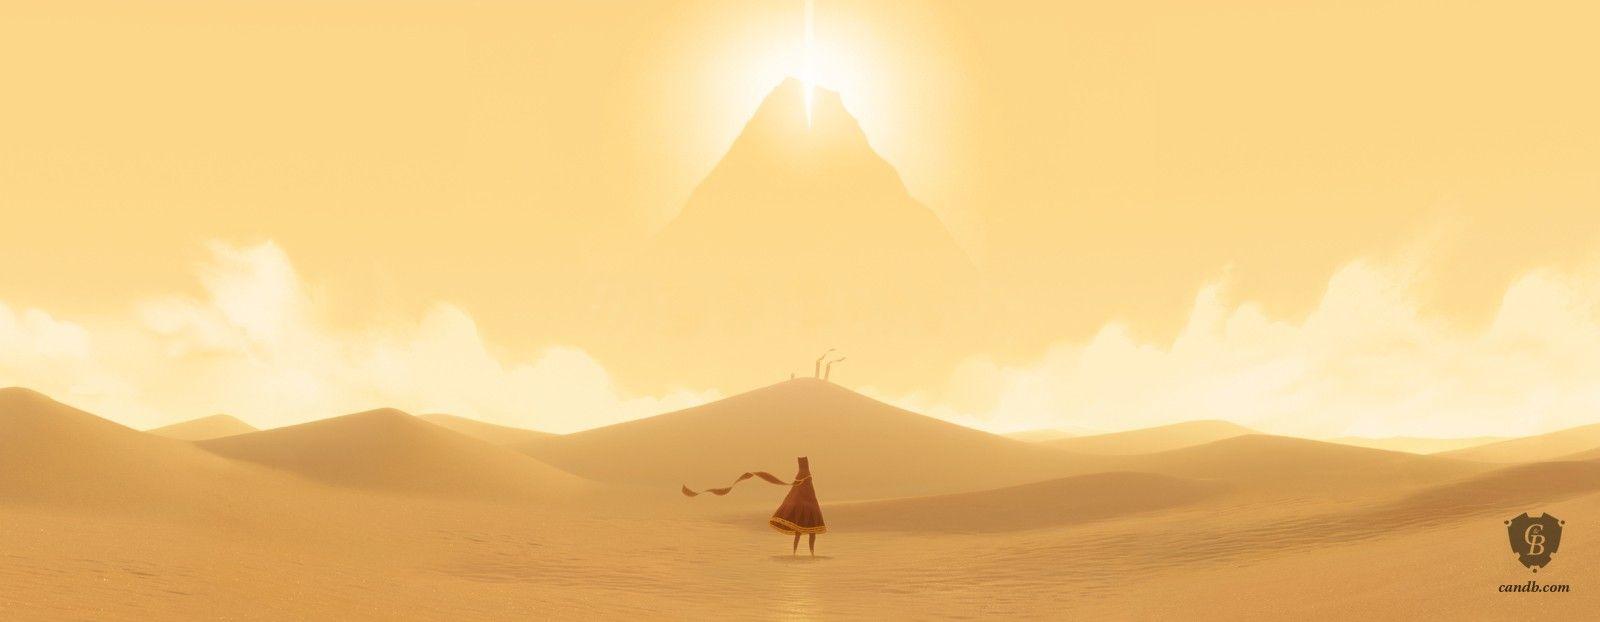 Journey, PlayStation 3, Thatgamecompany, CandB.com